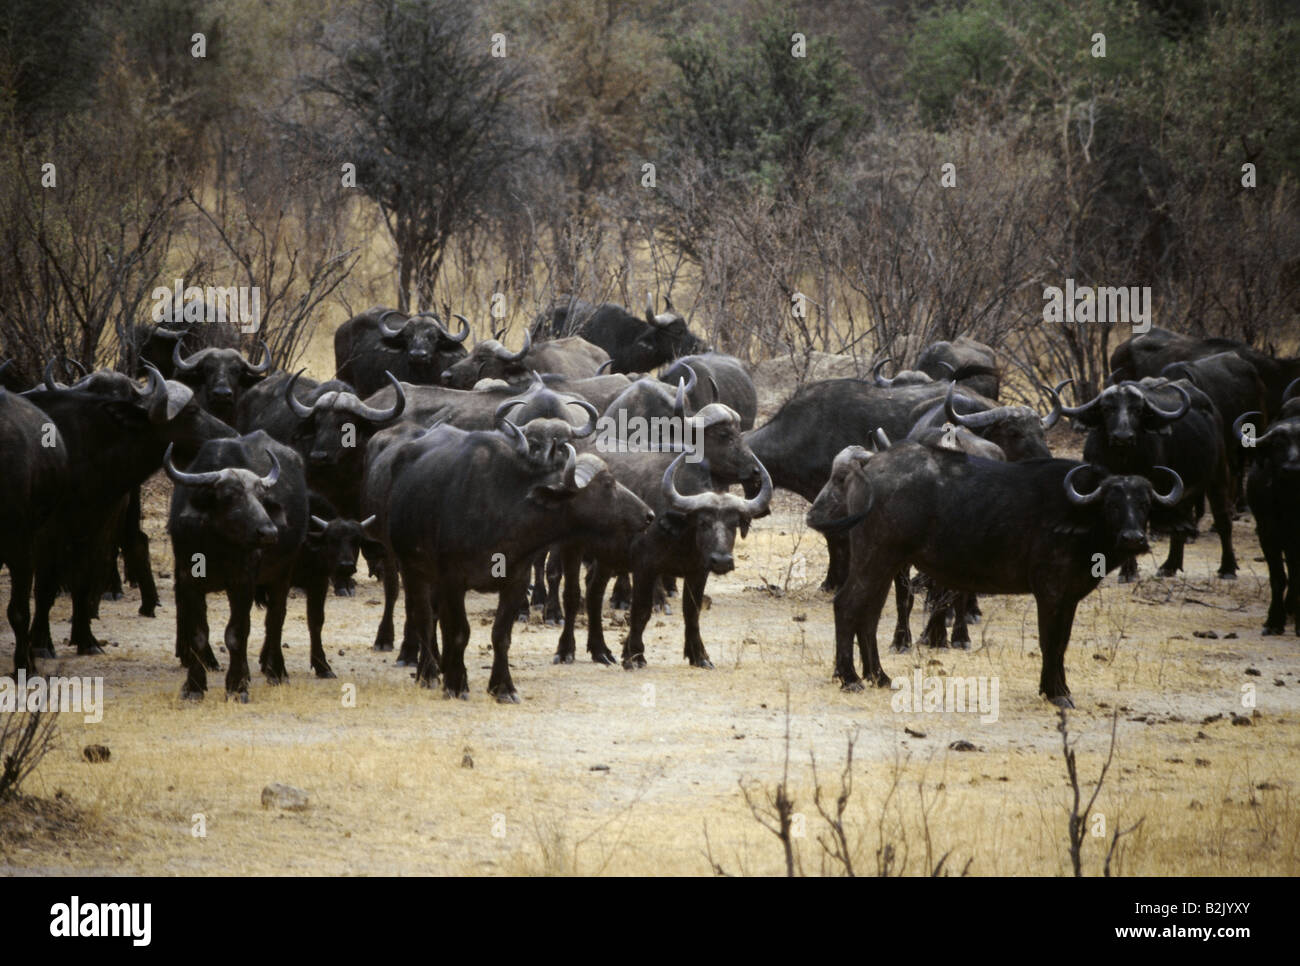 zoology / animals, mammal / mammalian, Bovidae, African Buffalo (Syncerus caffer), herd, Hwange National Park, Zimbabwe, Stock Photo